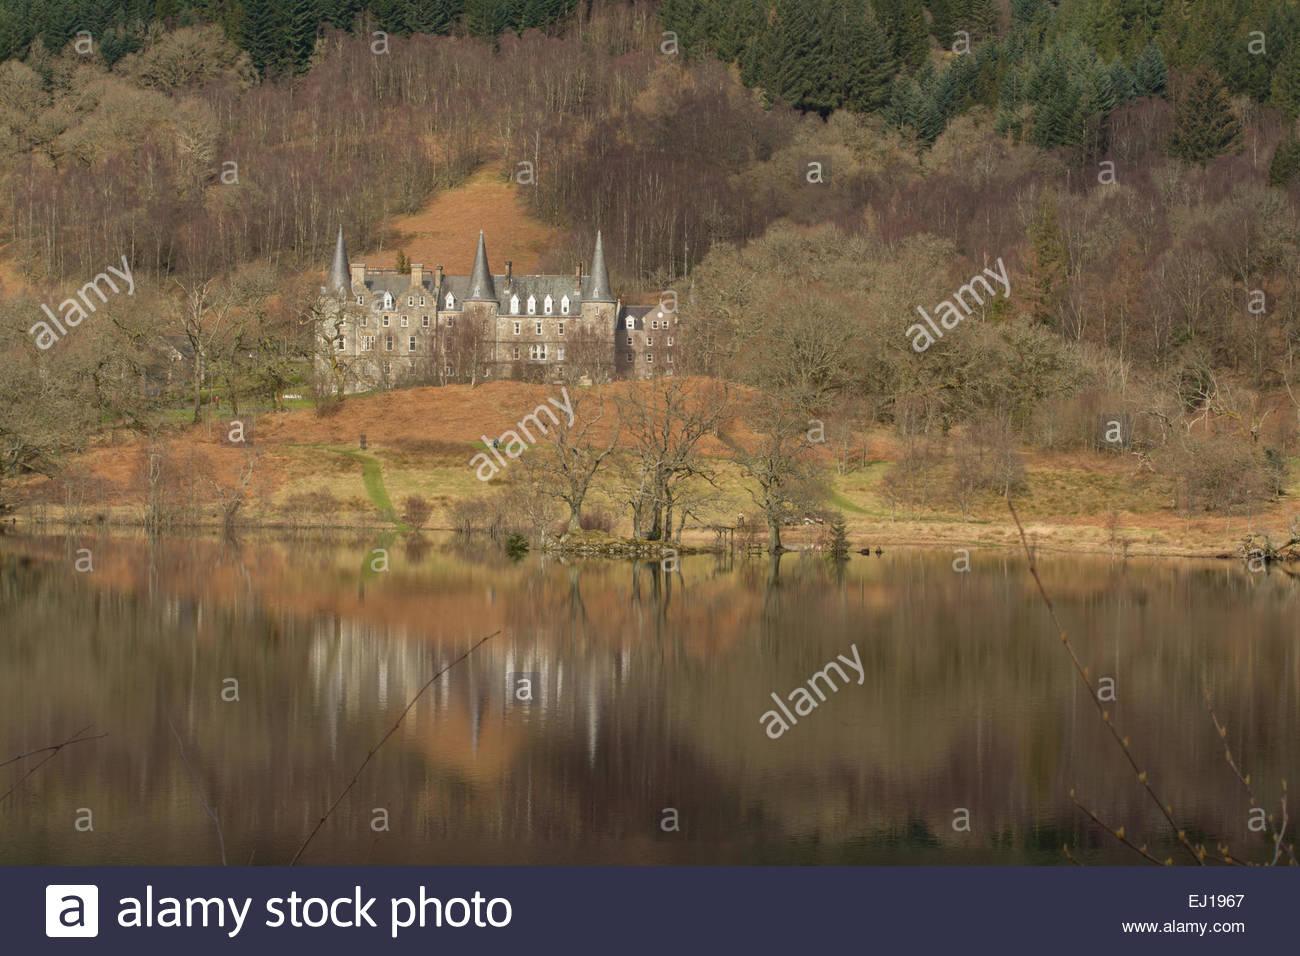 LOCH ACHRAY, LOCH LOMOND & THE TROSSACHS NATIONAL PARK, STIRLINGSHIRE, Schottland, UK 2015: Tigh Mor Trossachs Stockbild